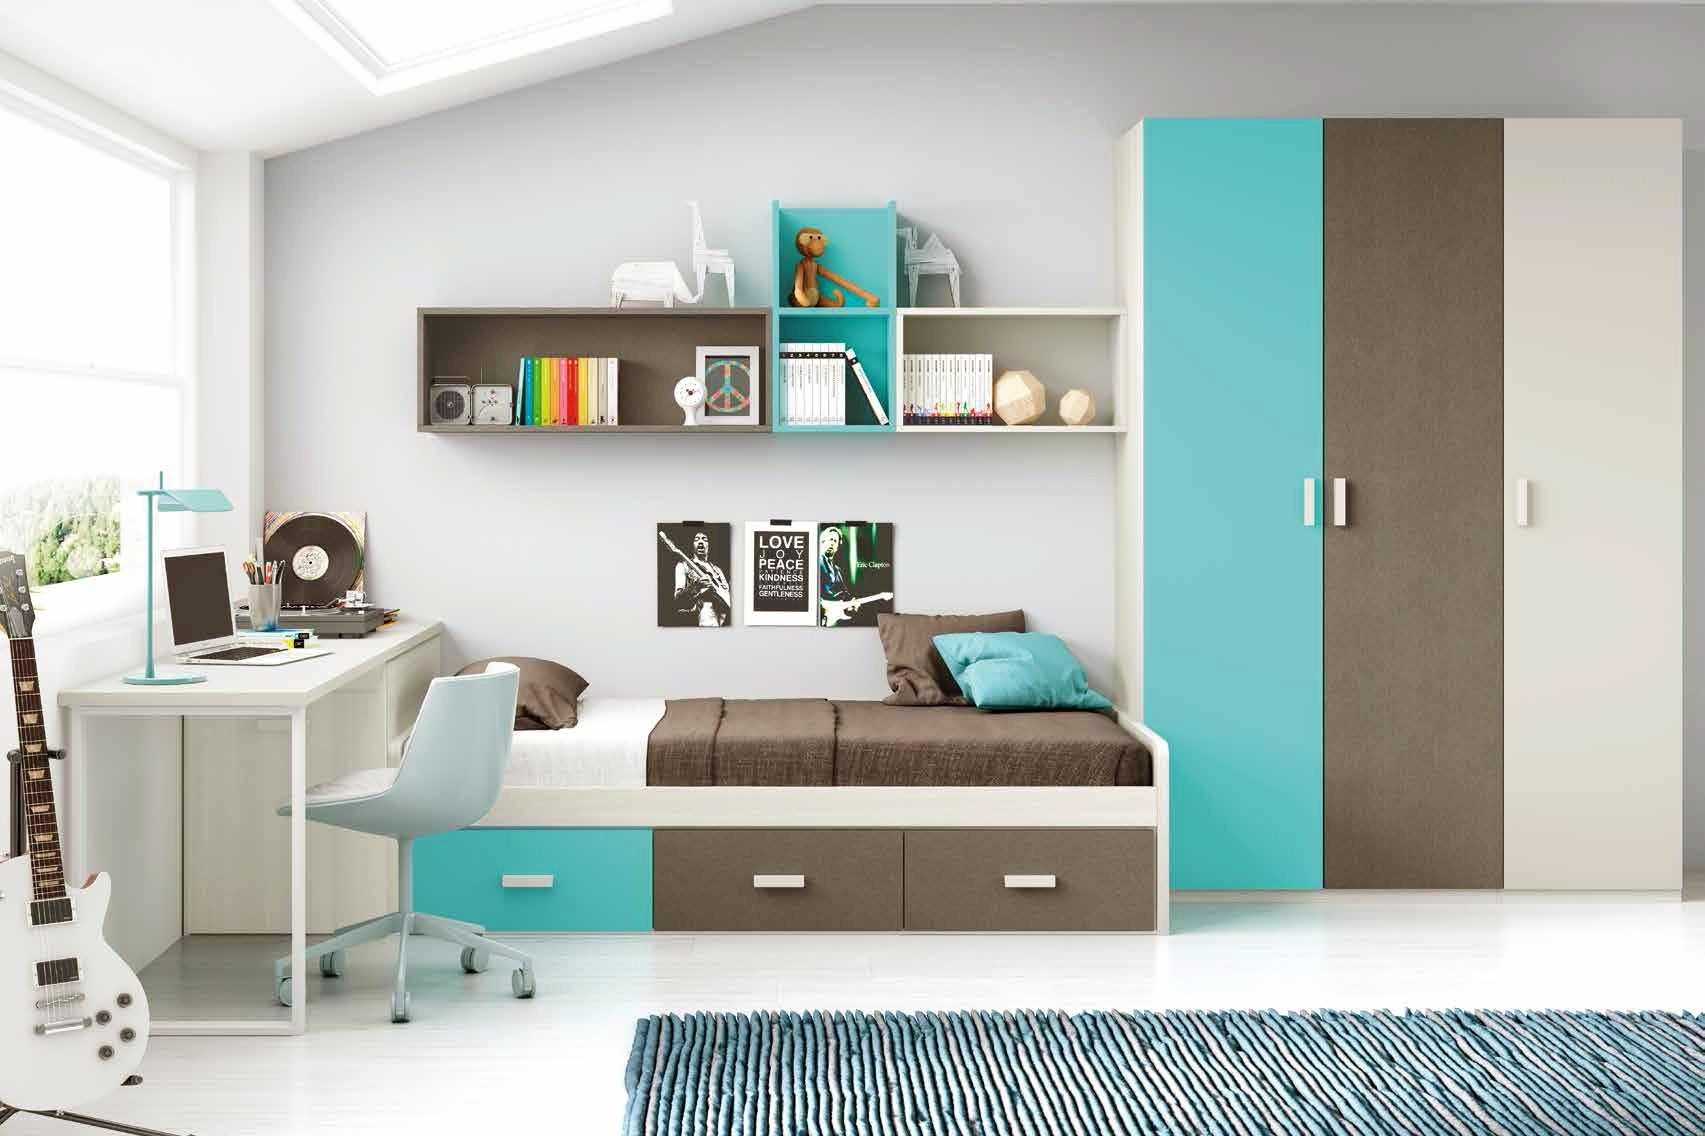 Chambre moderne ado et fun avec lit 3 coffres  GLICERIO  SO NUIT